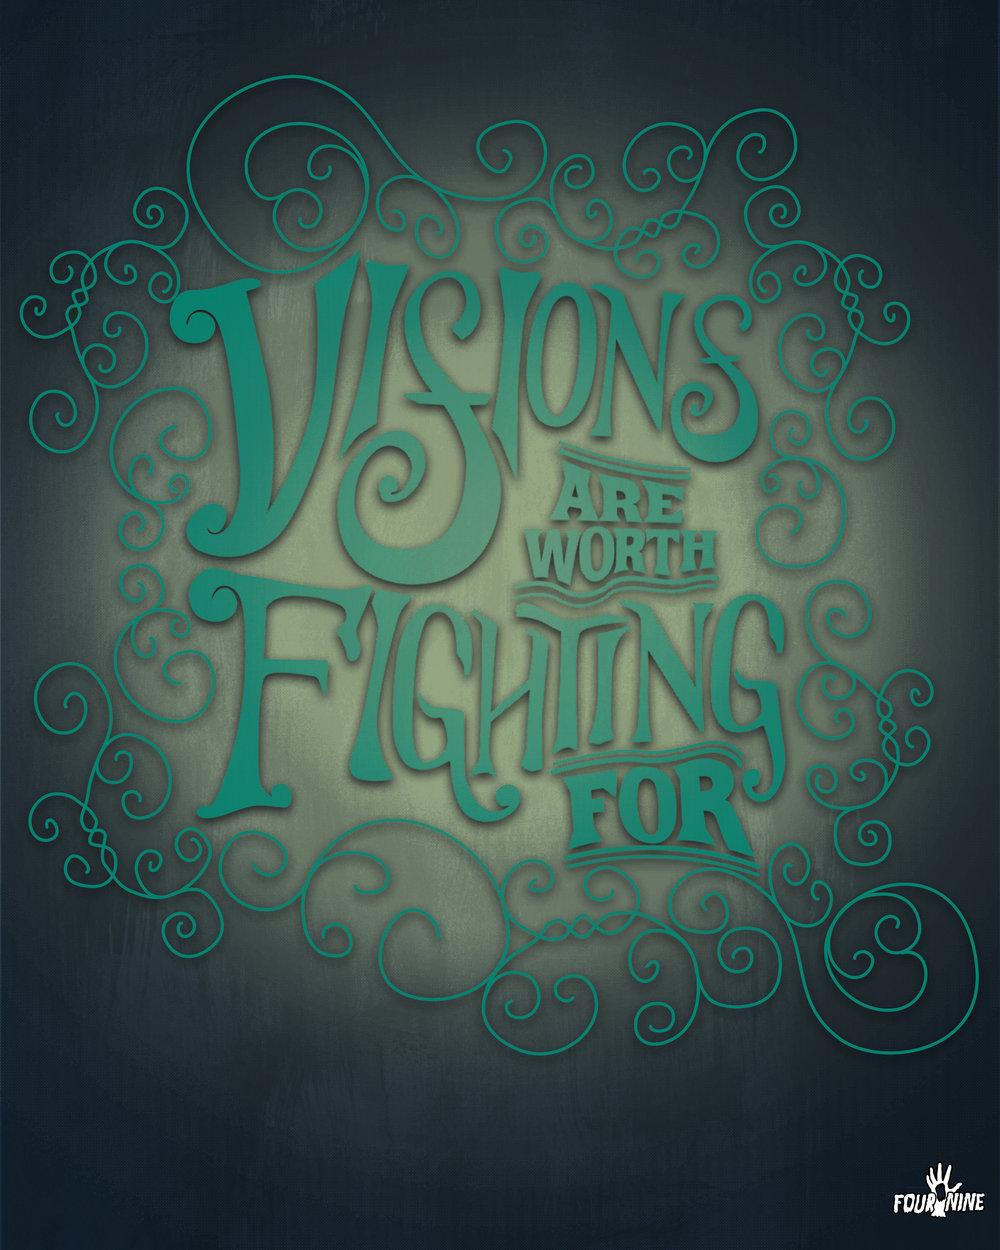 visions-final_small.jpg